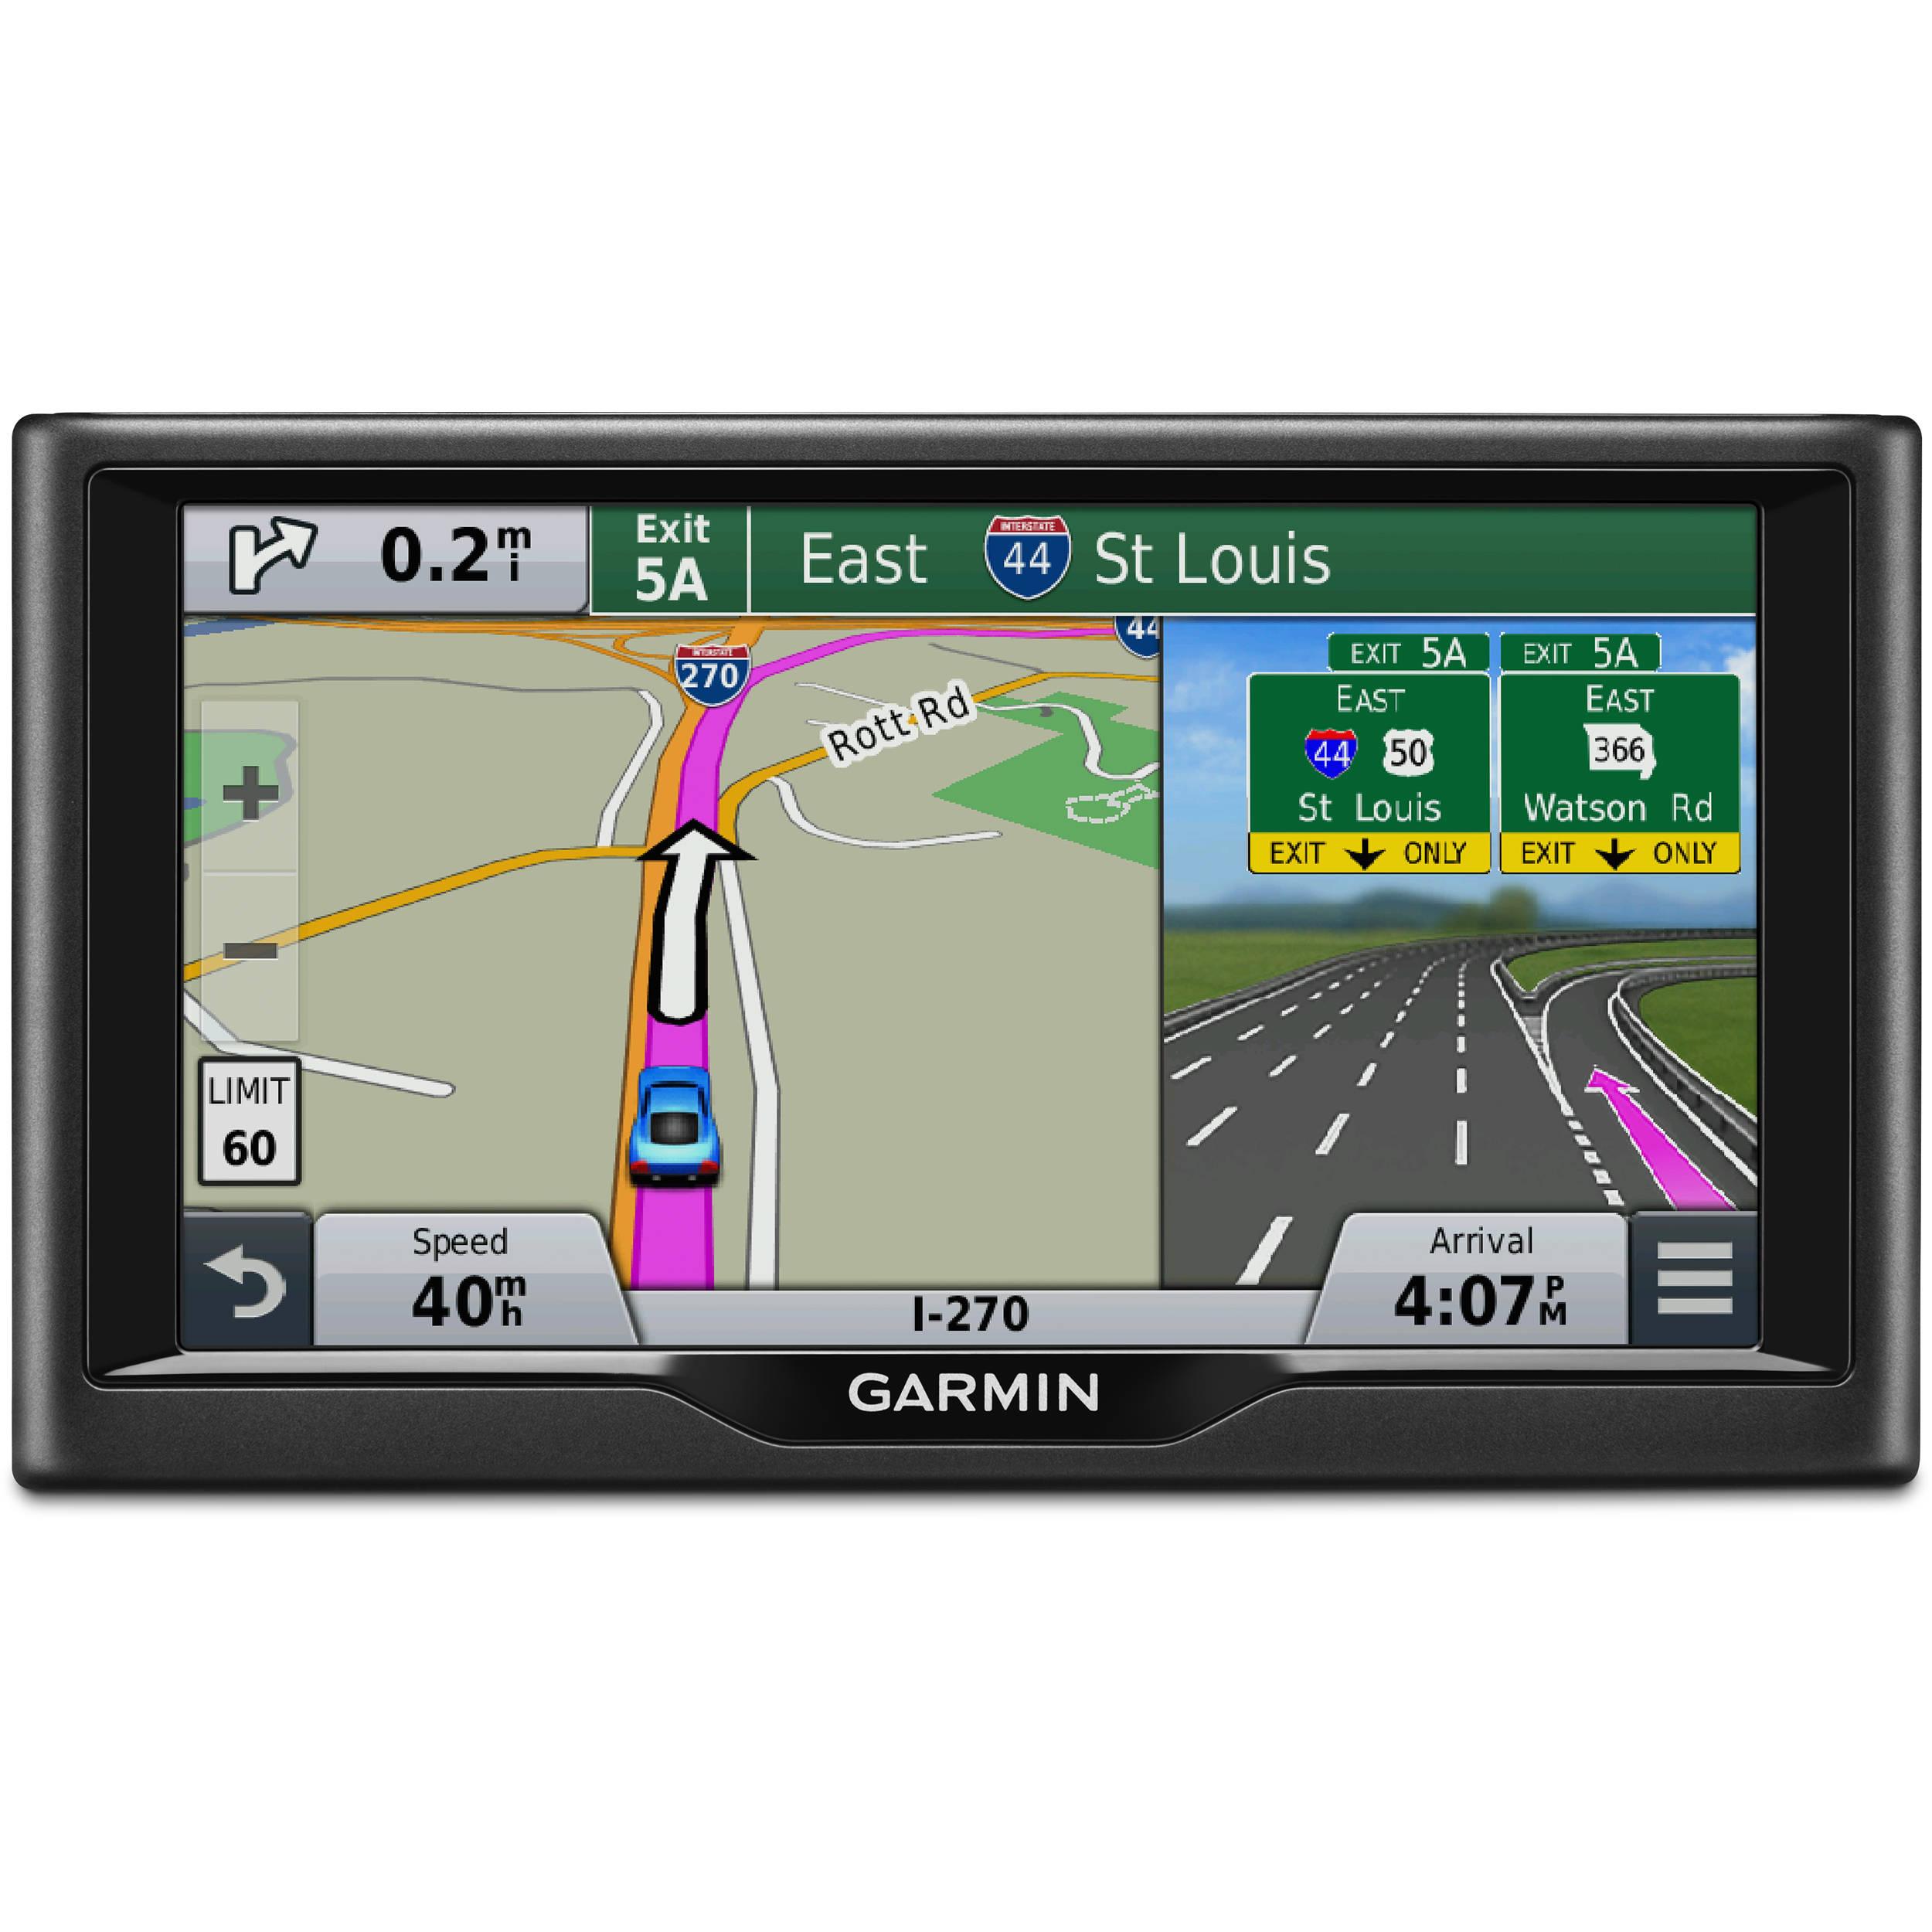 Canada Map For Garmin Nuvi Garmin nuvi 68LMT GPS With U.S. and Canada Maps 010 01399 05 B&H